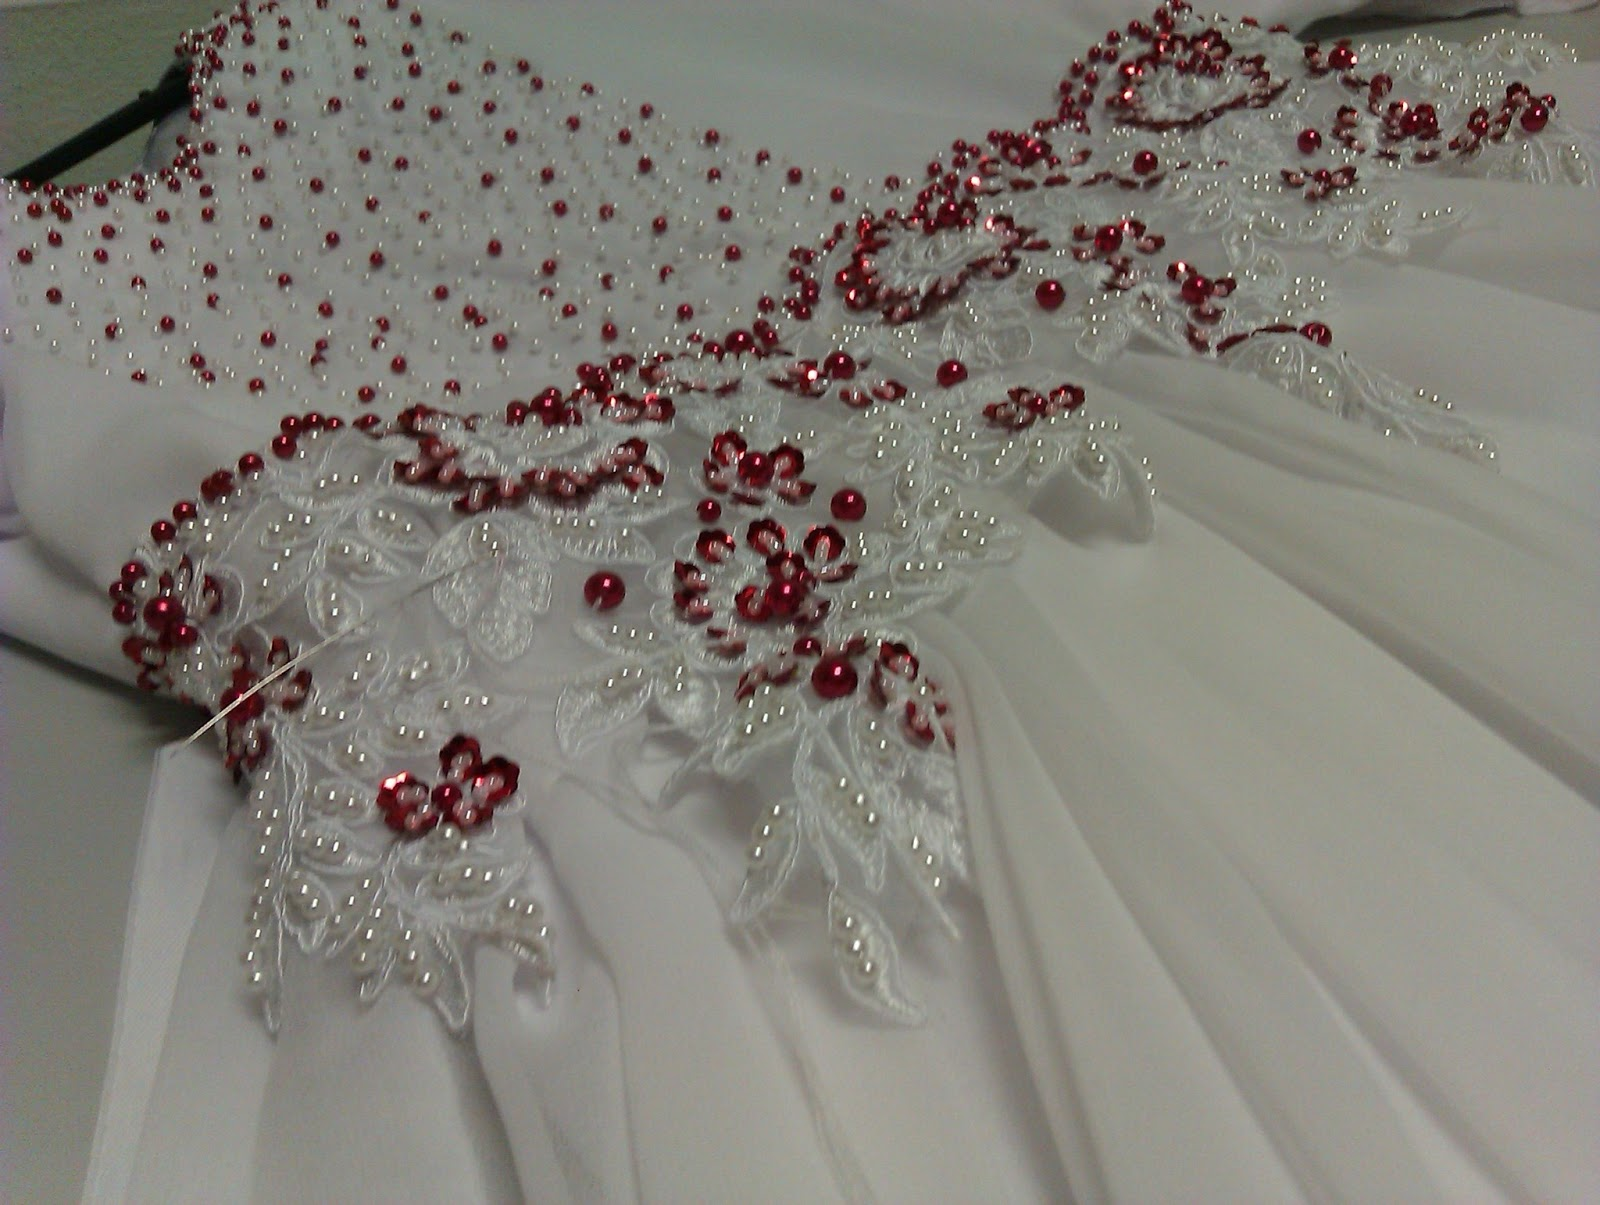 SULAM MANIK DAN LABUCI WEDDING DRESS | manik manik manik